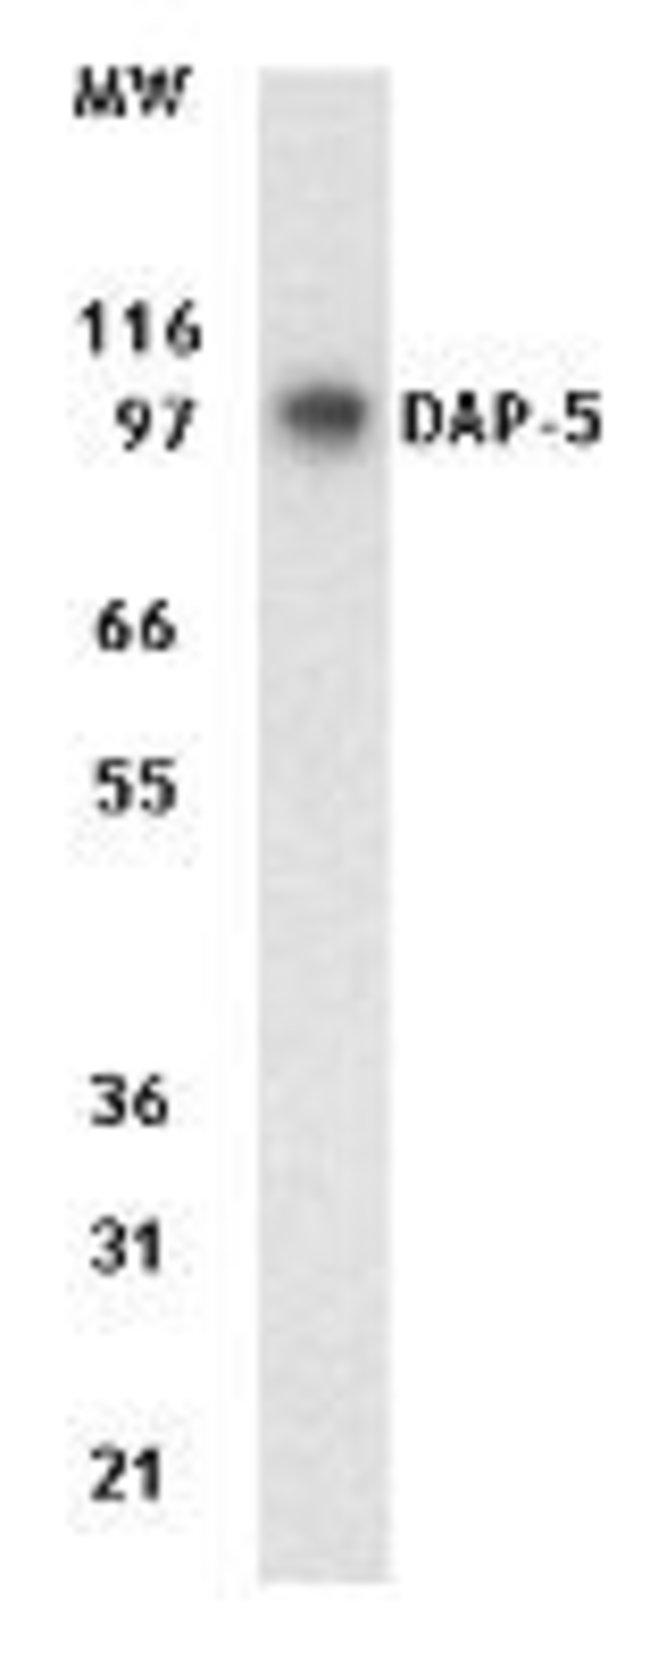 DAP5 Mouse anti-Human, Mouse, Clone: 39C534.1, Invitrogen 100 µg;